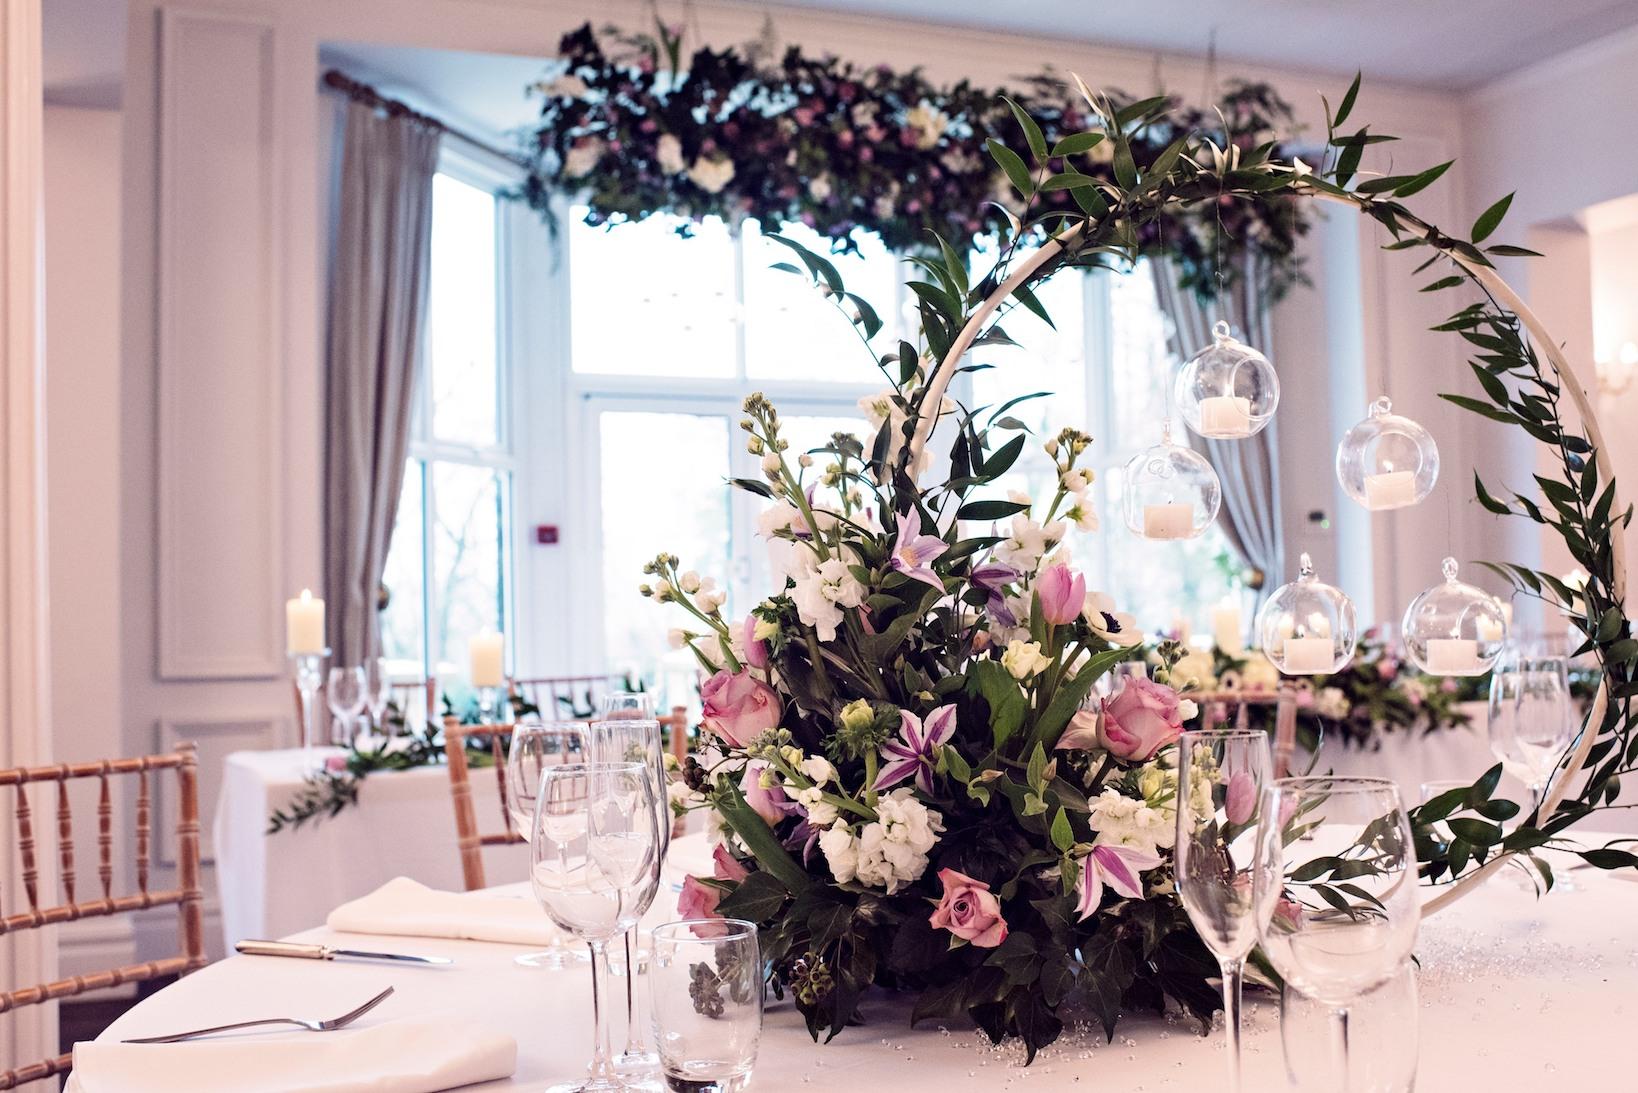 FLORAL HOOPS TREND ASHFIELD HOUSE WEDDING VENUE